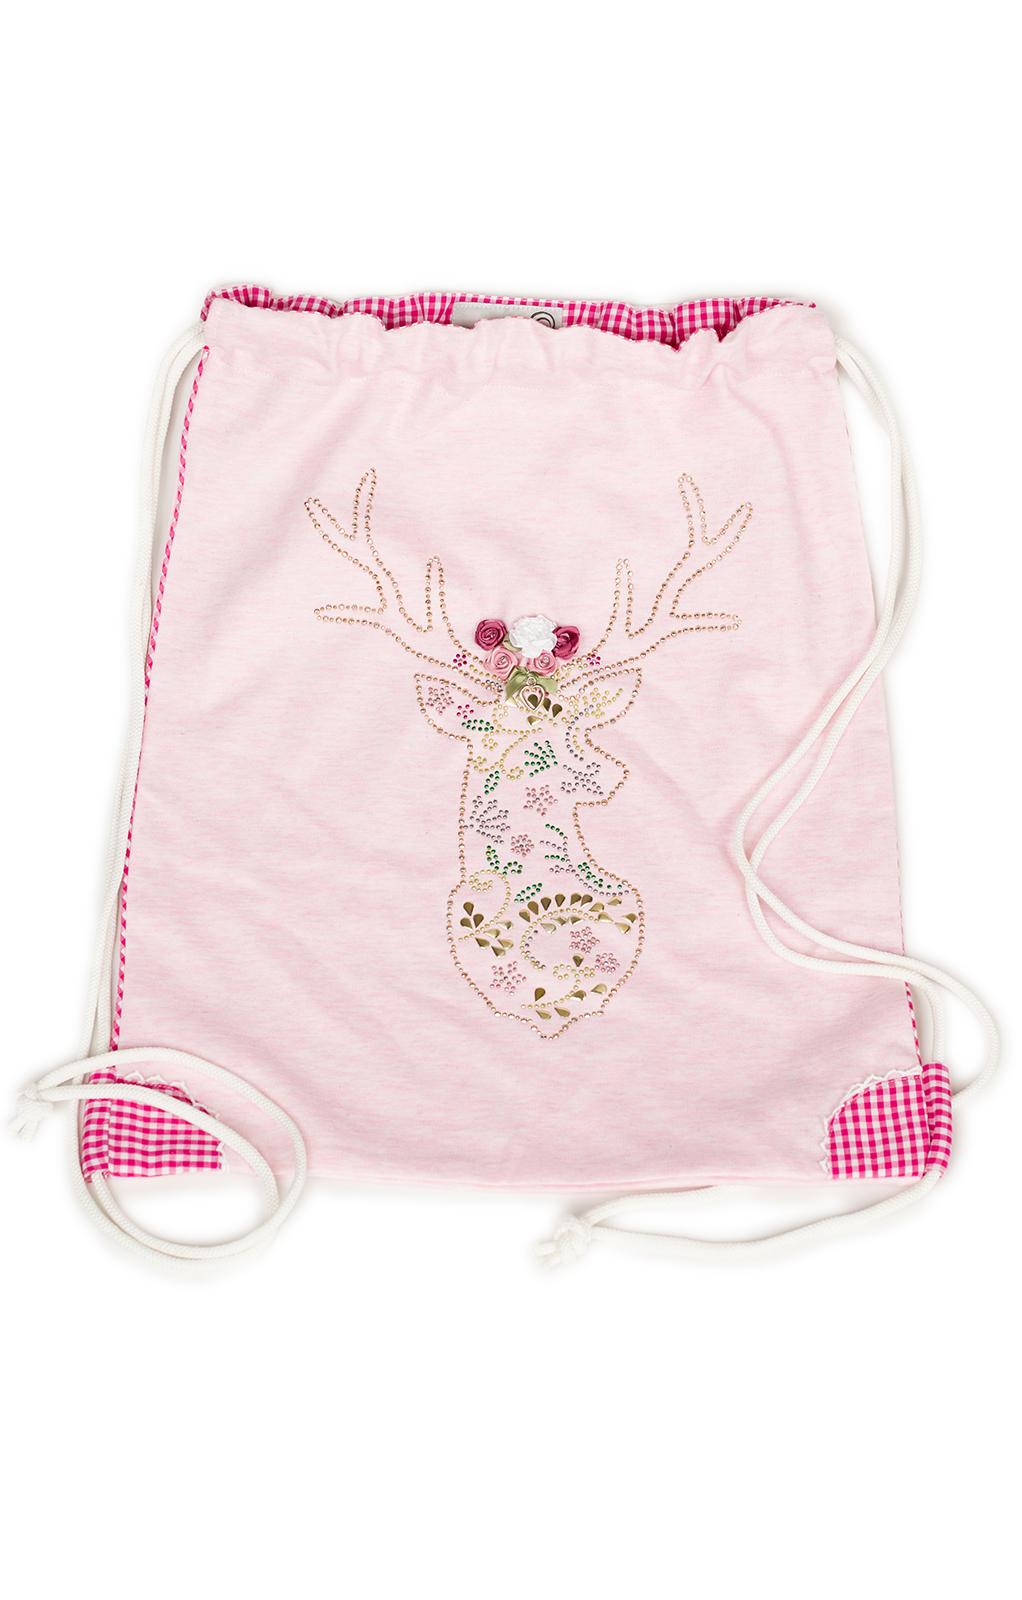 Bambi-Gymback rosa von Marjo